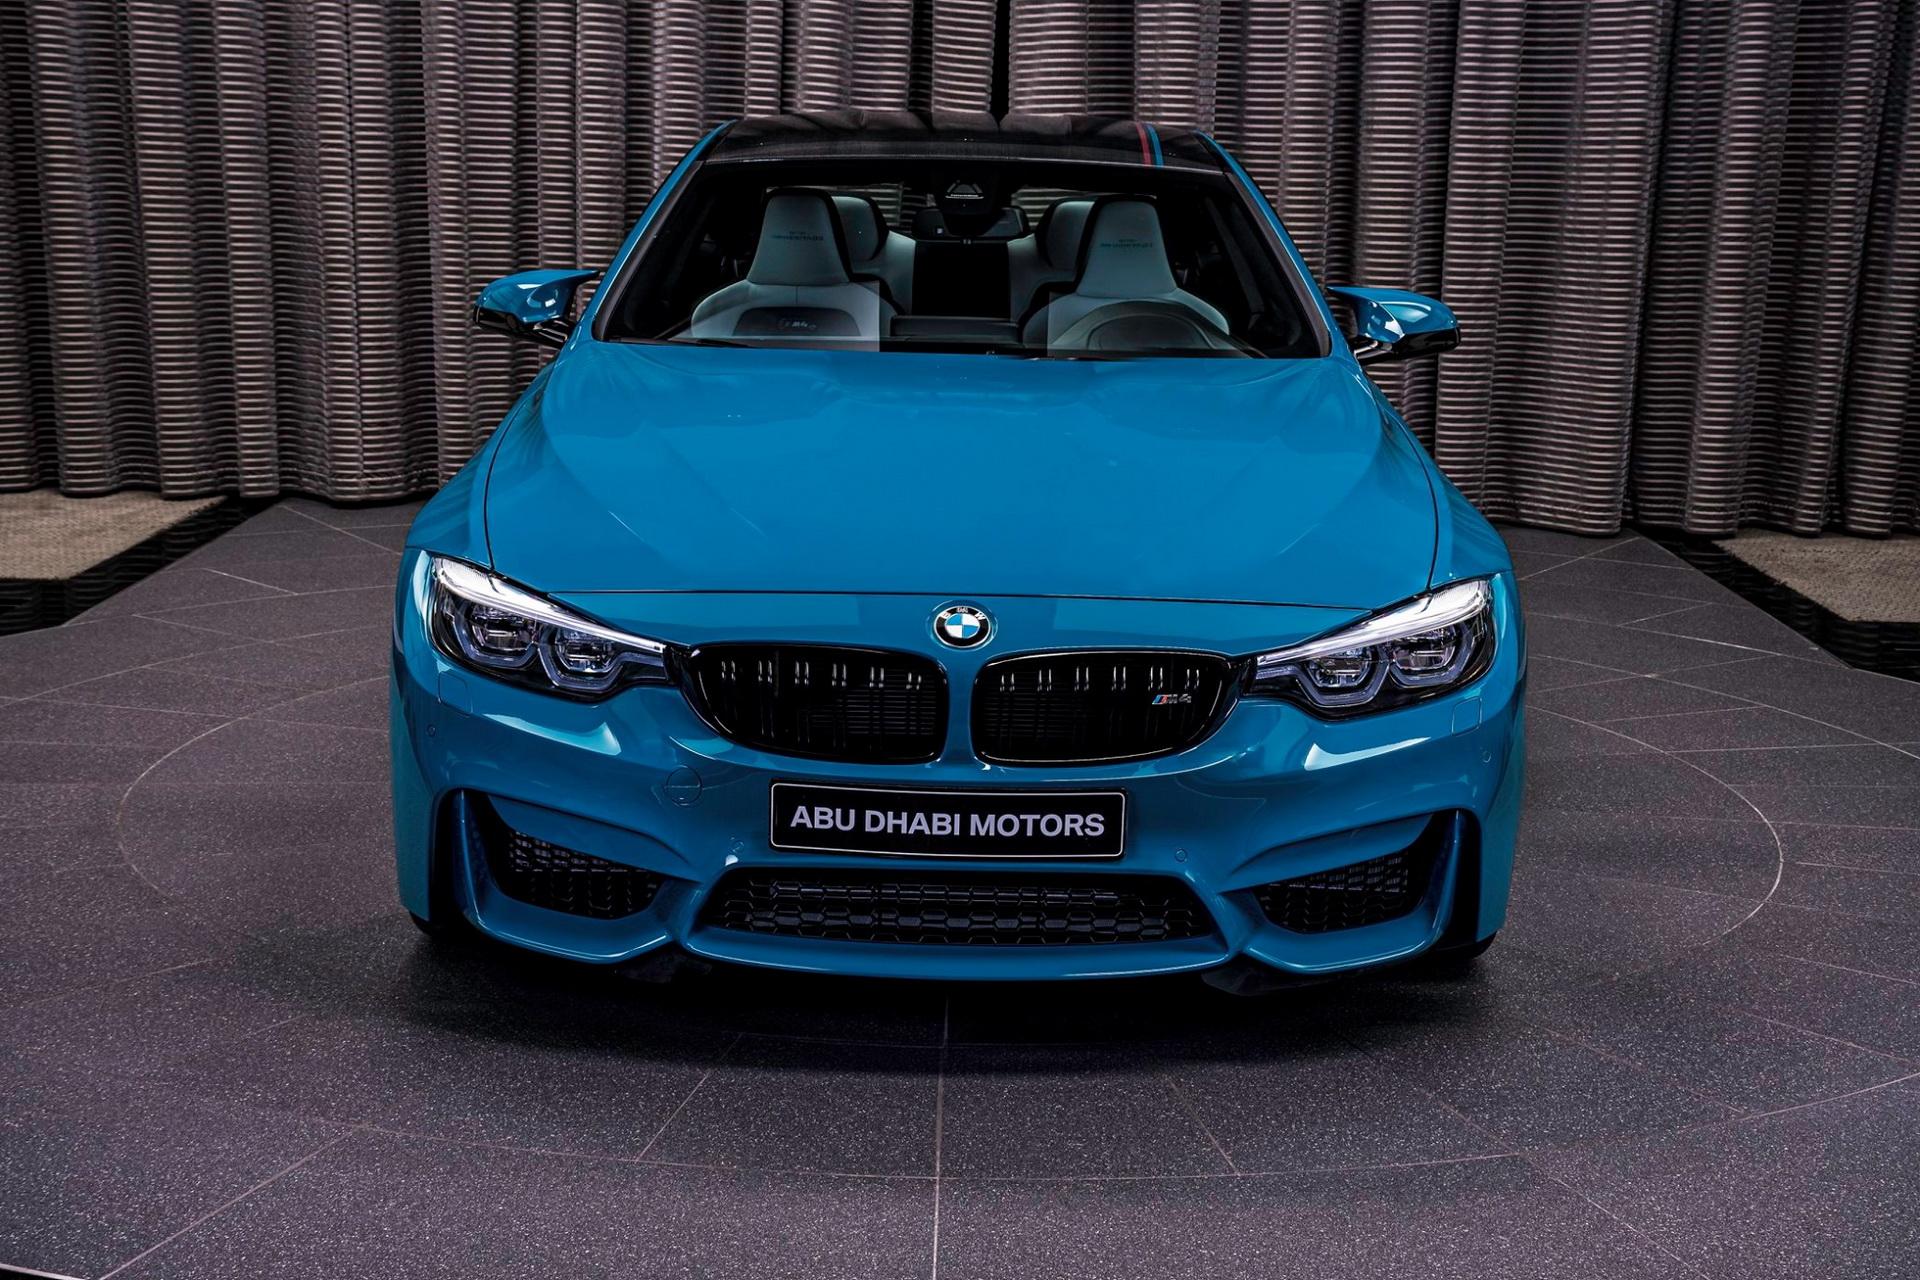 BMW-M4-Edition-M-Heritage-Abu-Dhabi-Motors-1